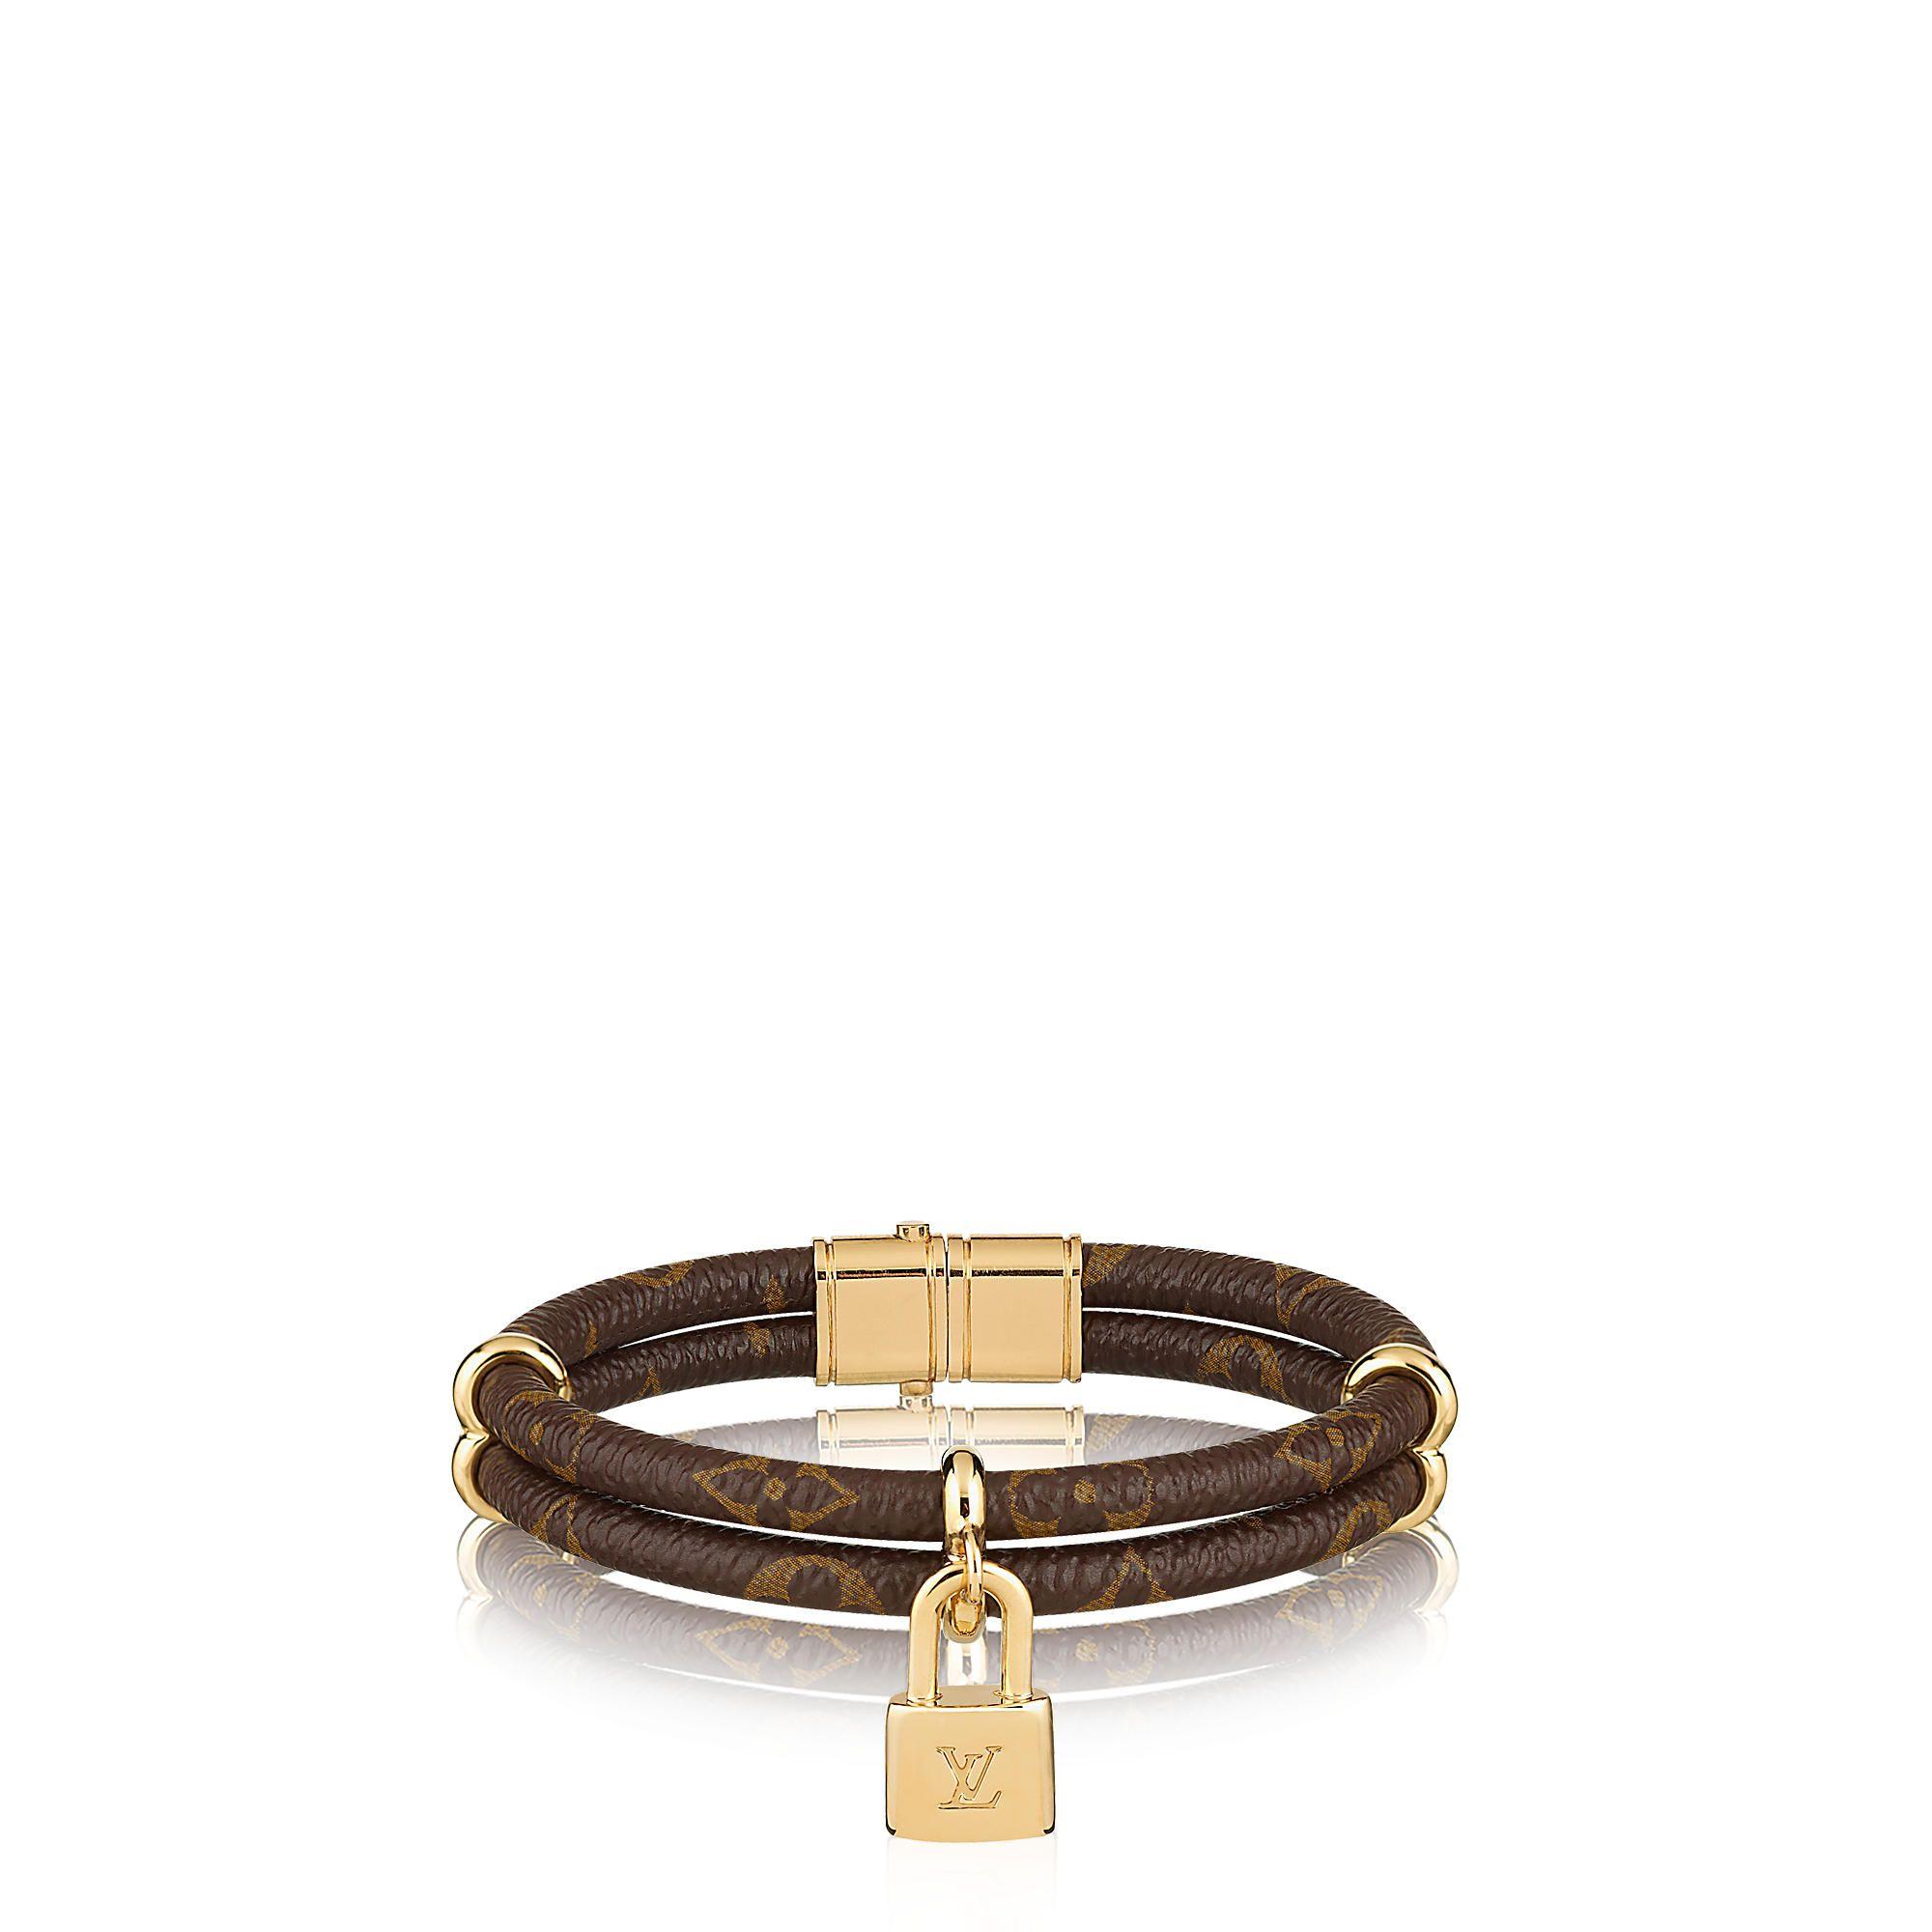 Discover Louis Vuitton Keep it Twice Monogram Bracelet via Louis Vuitton 8f58988ae3b